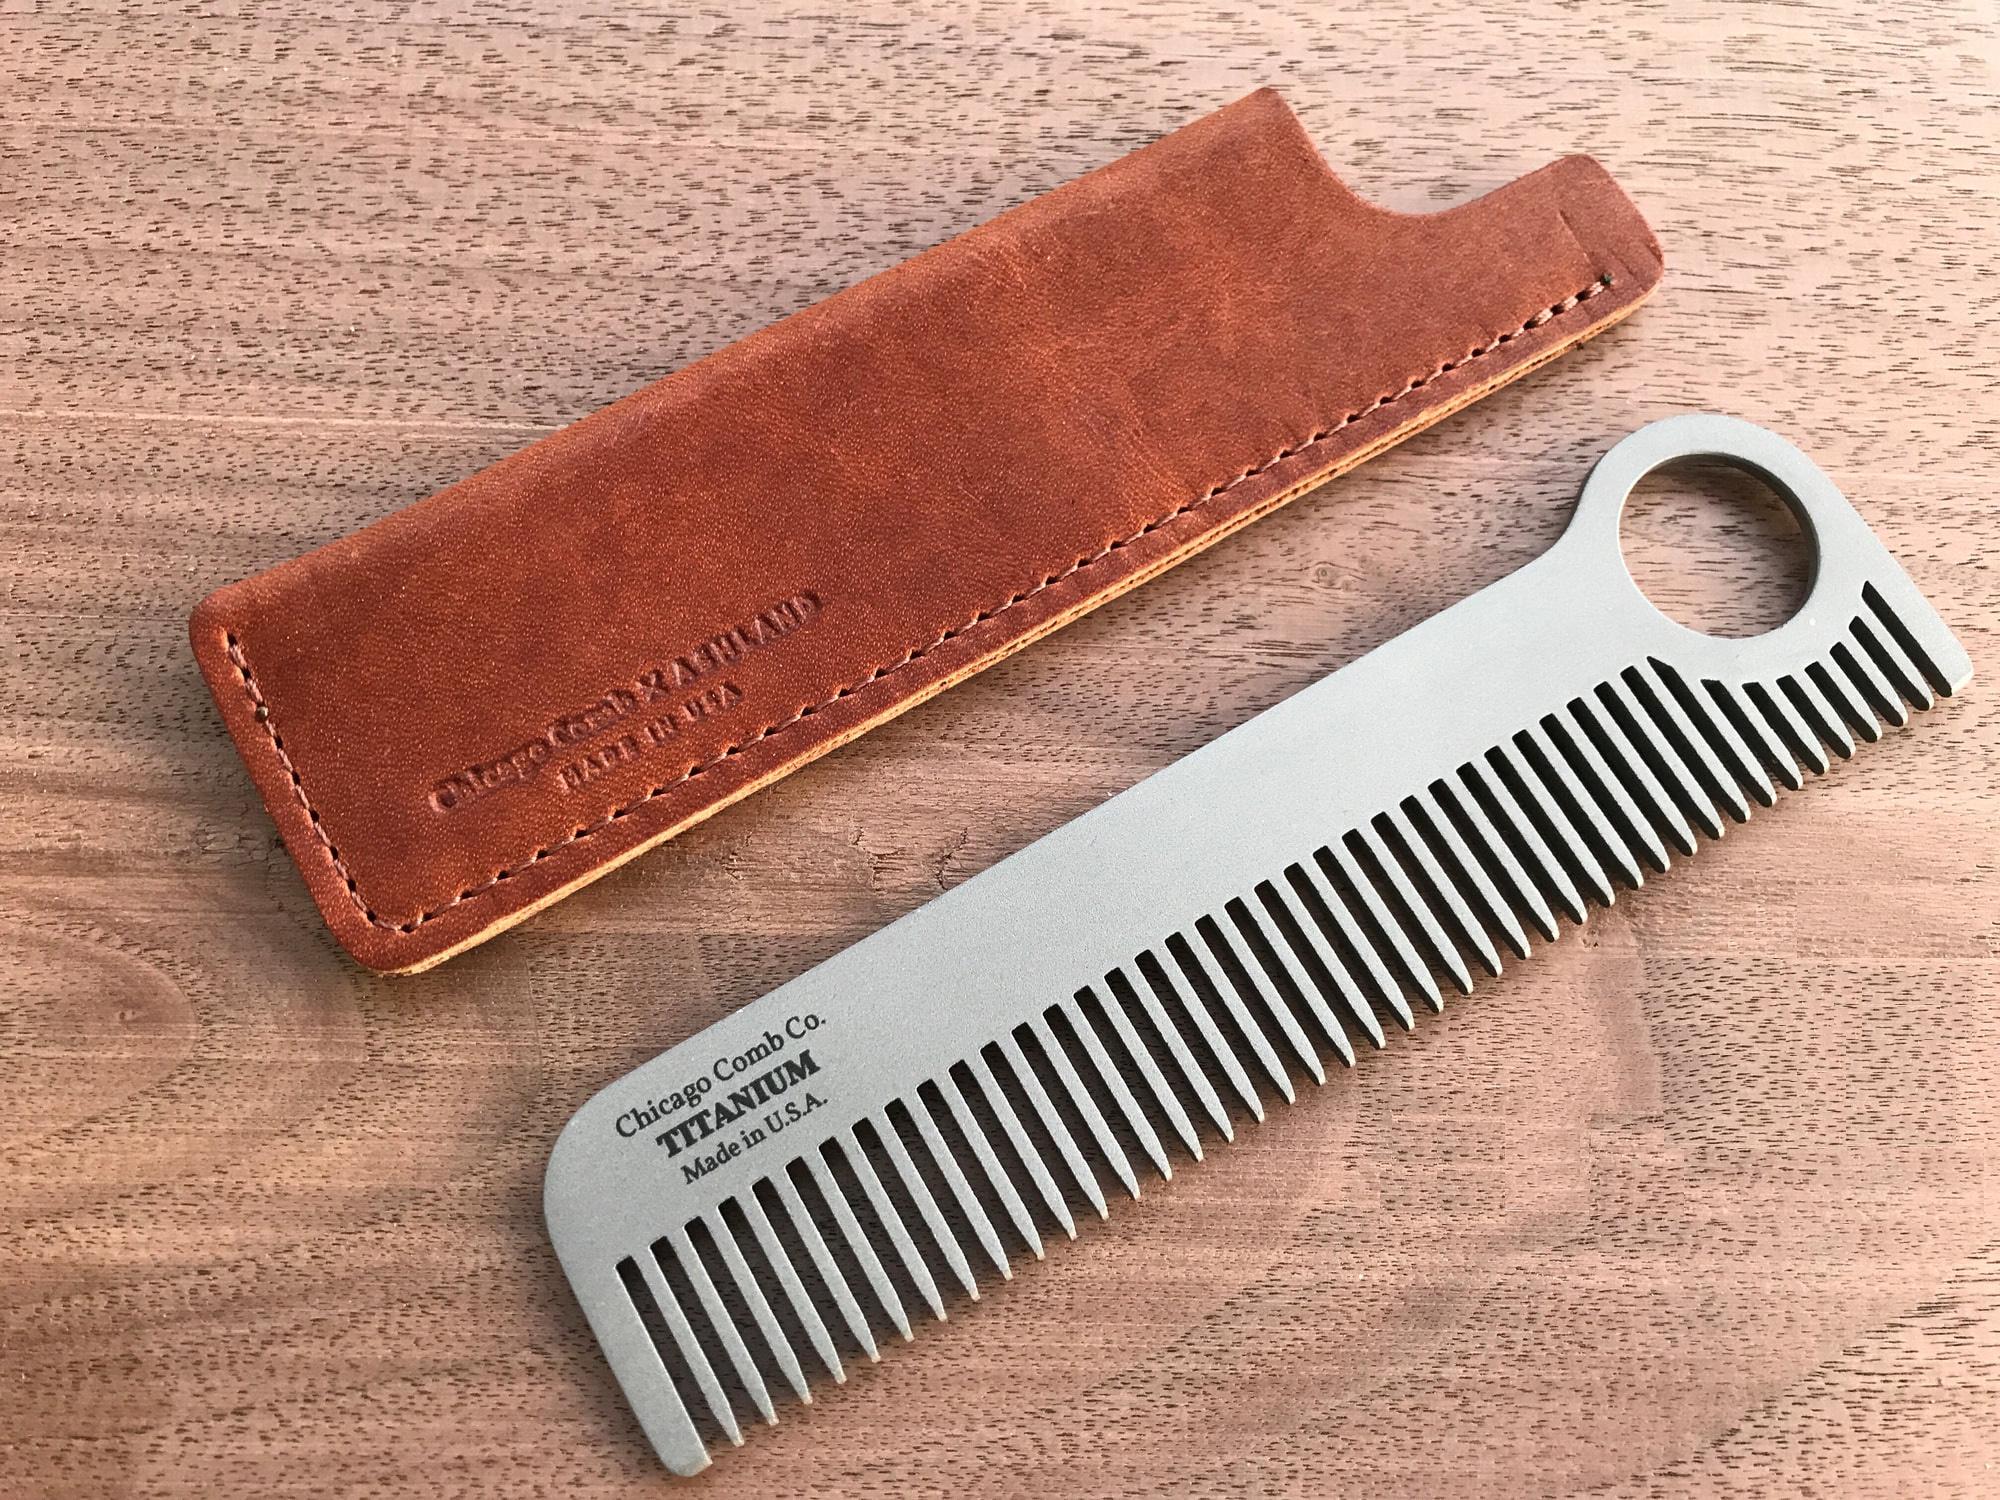 Chicago Comb Company Model 1